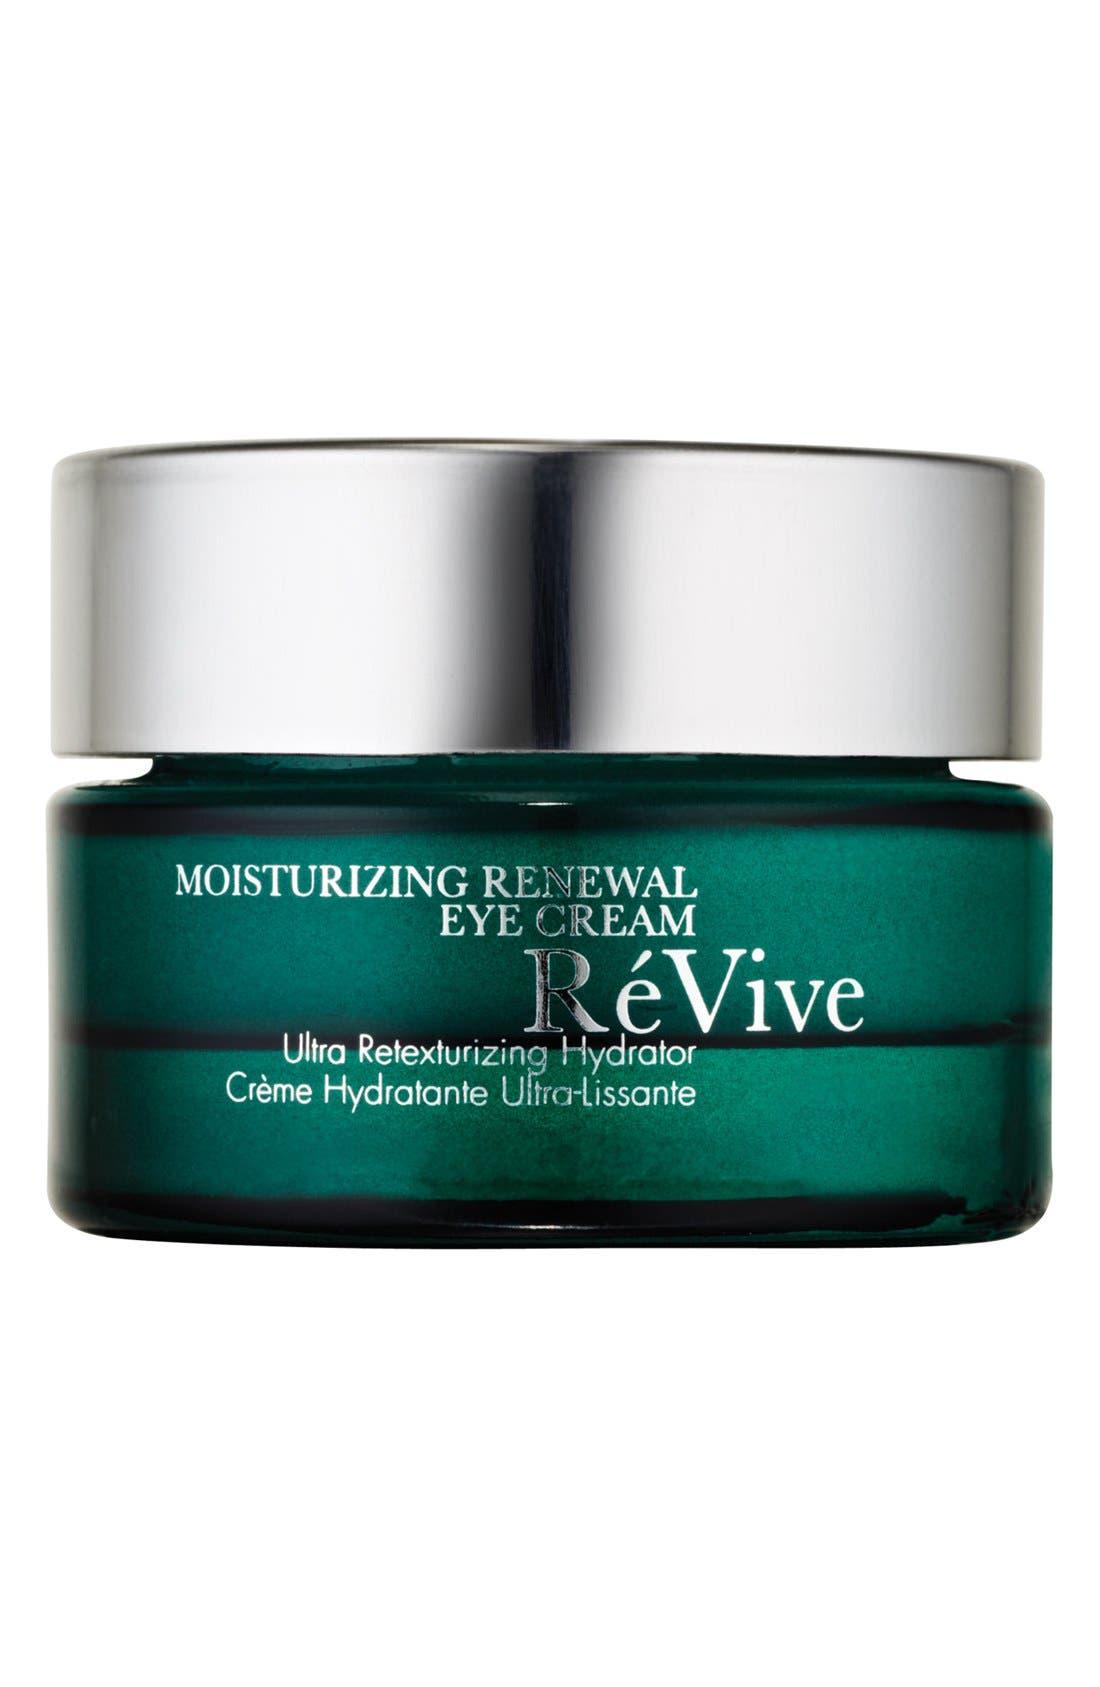 Revive Moisturizing Renewal Eye Cream Ultra Retexturizing Hydrator, Size 0.5 oz